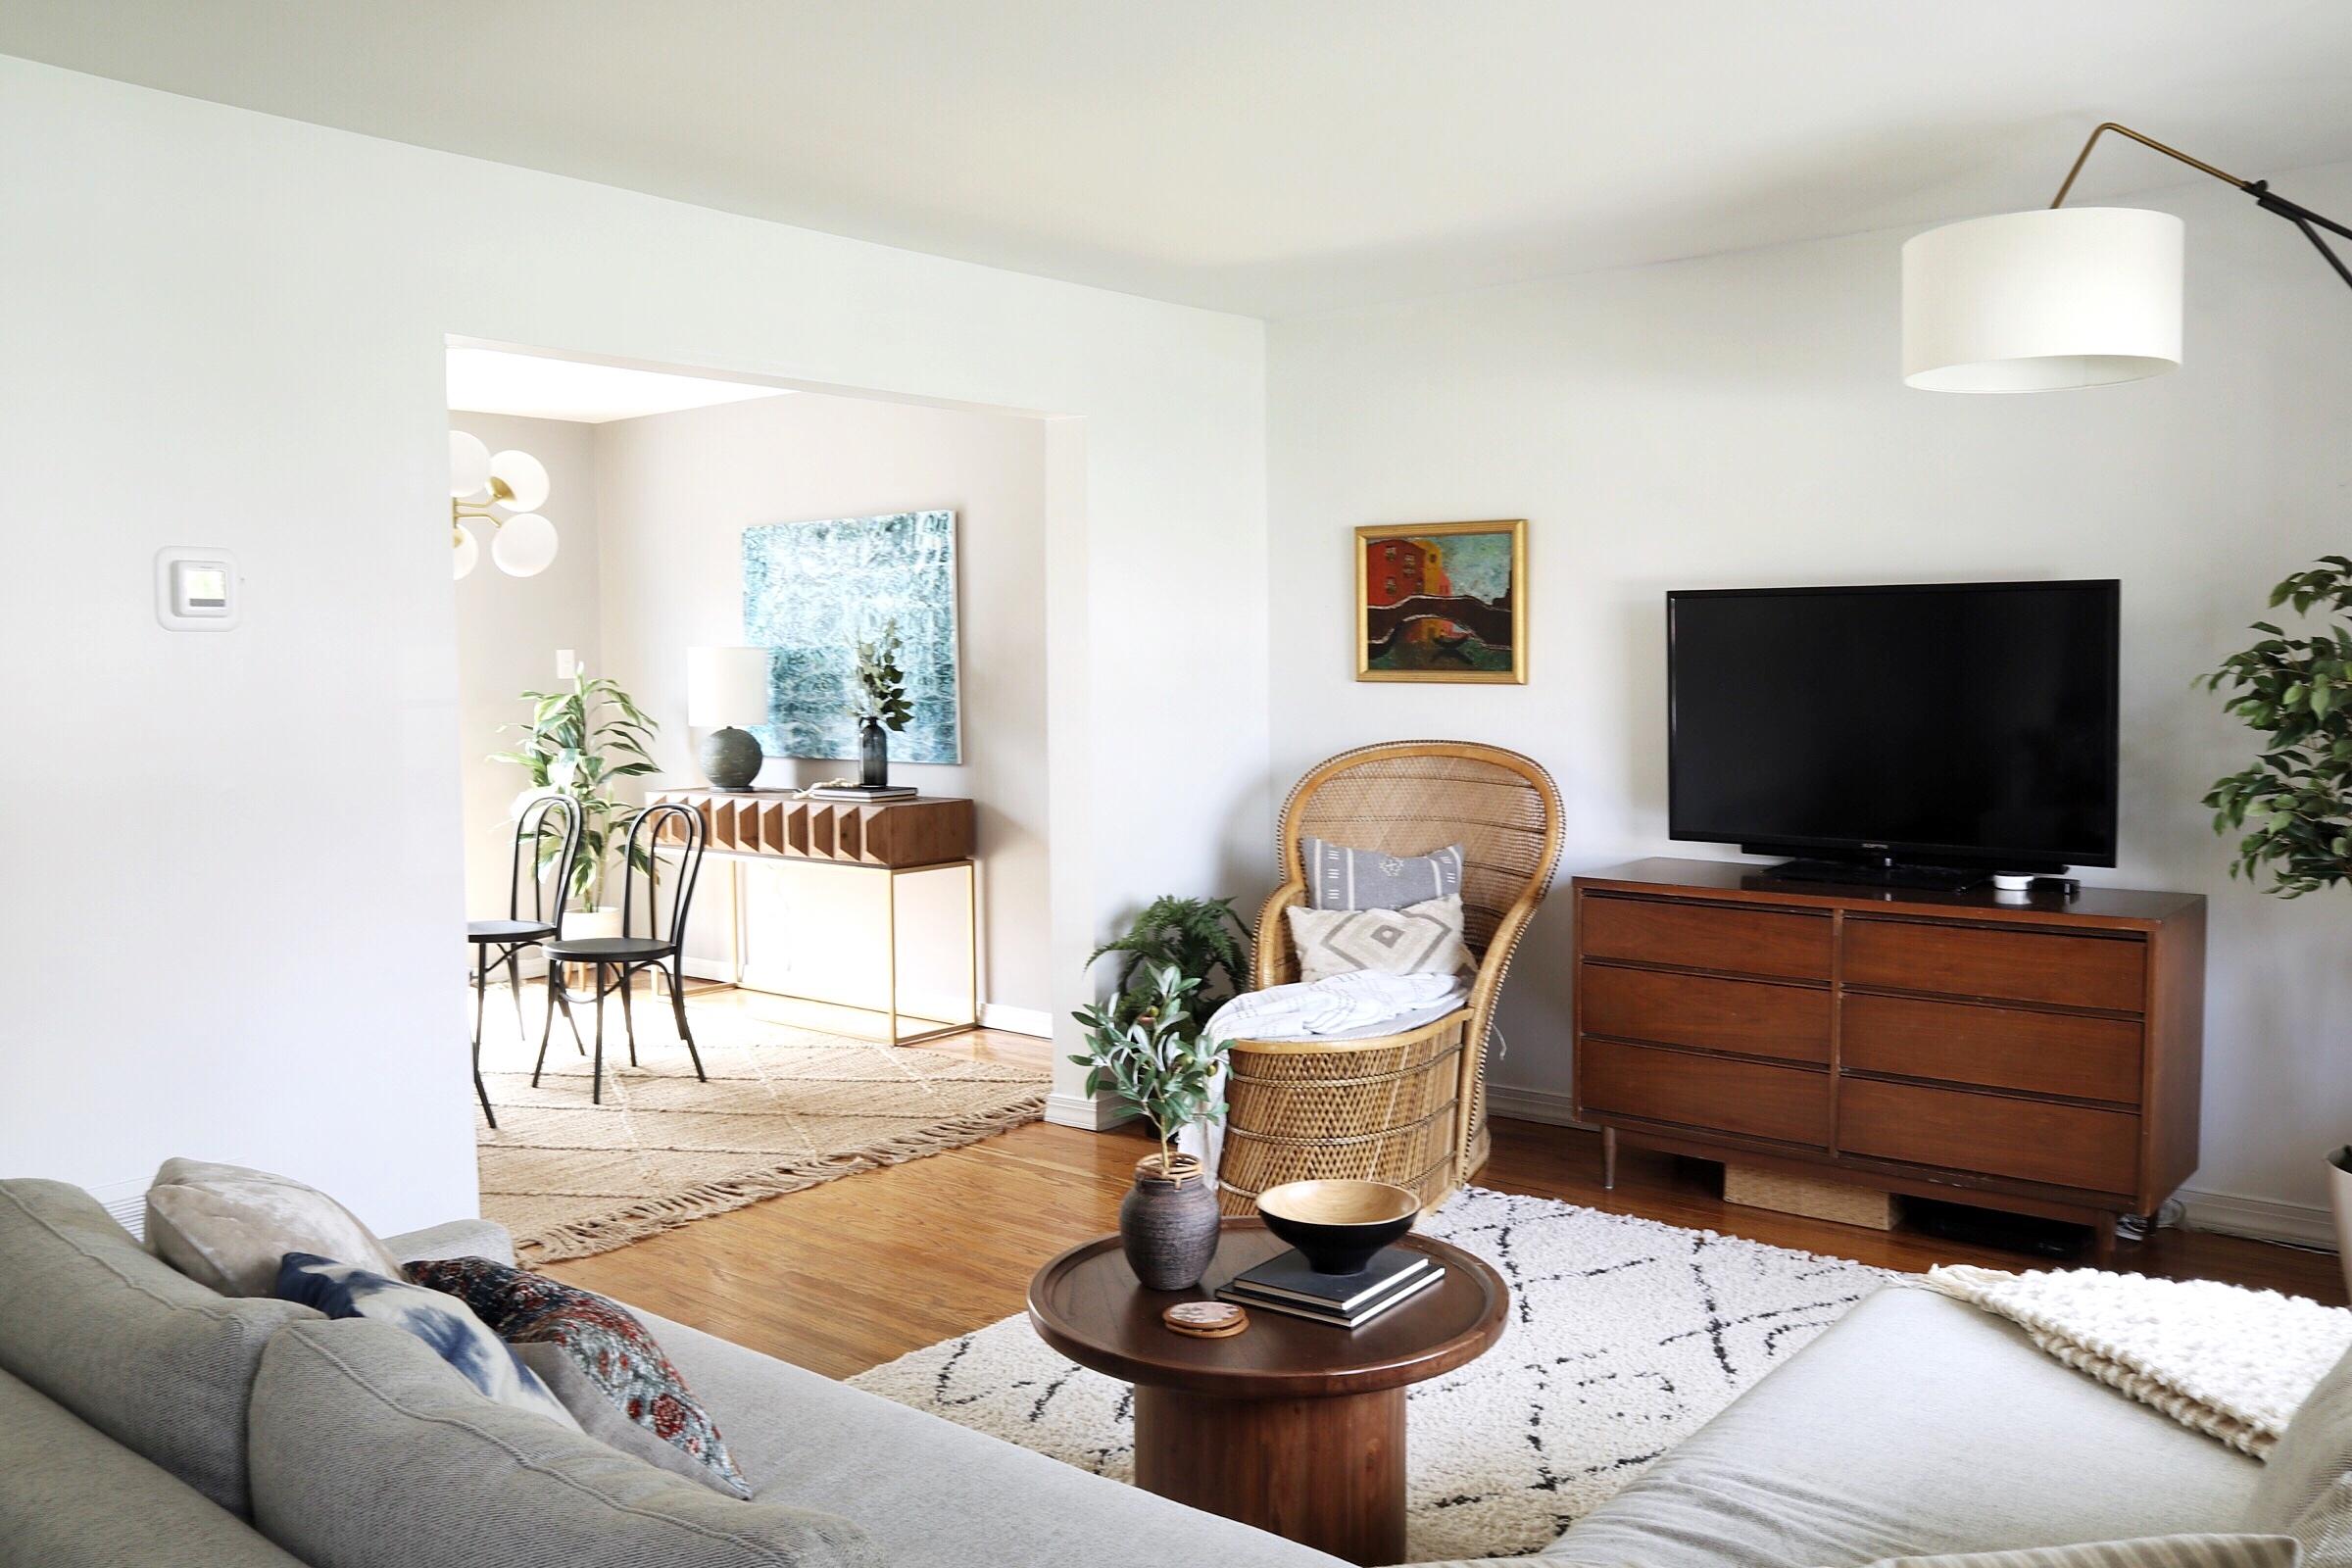 modern-mcm-eclectic-living-room.jpg